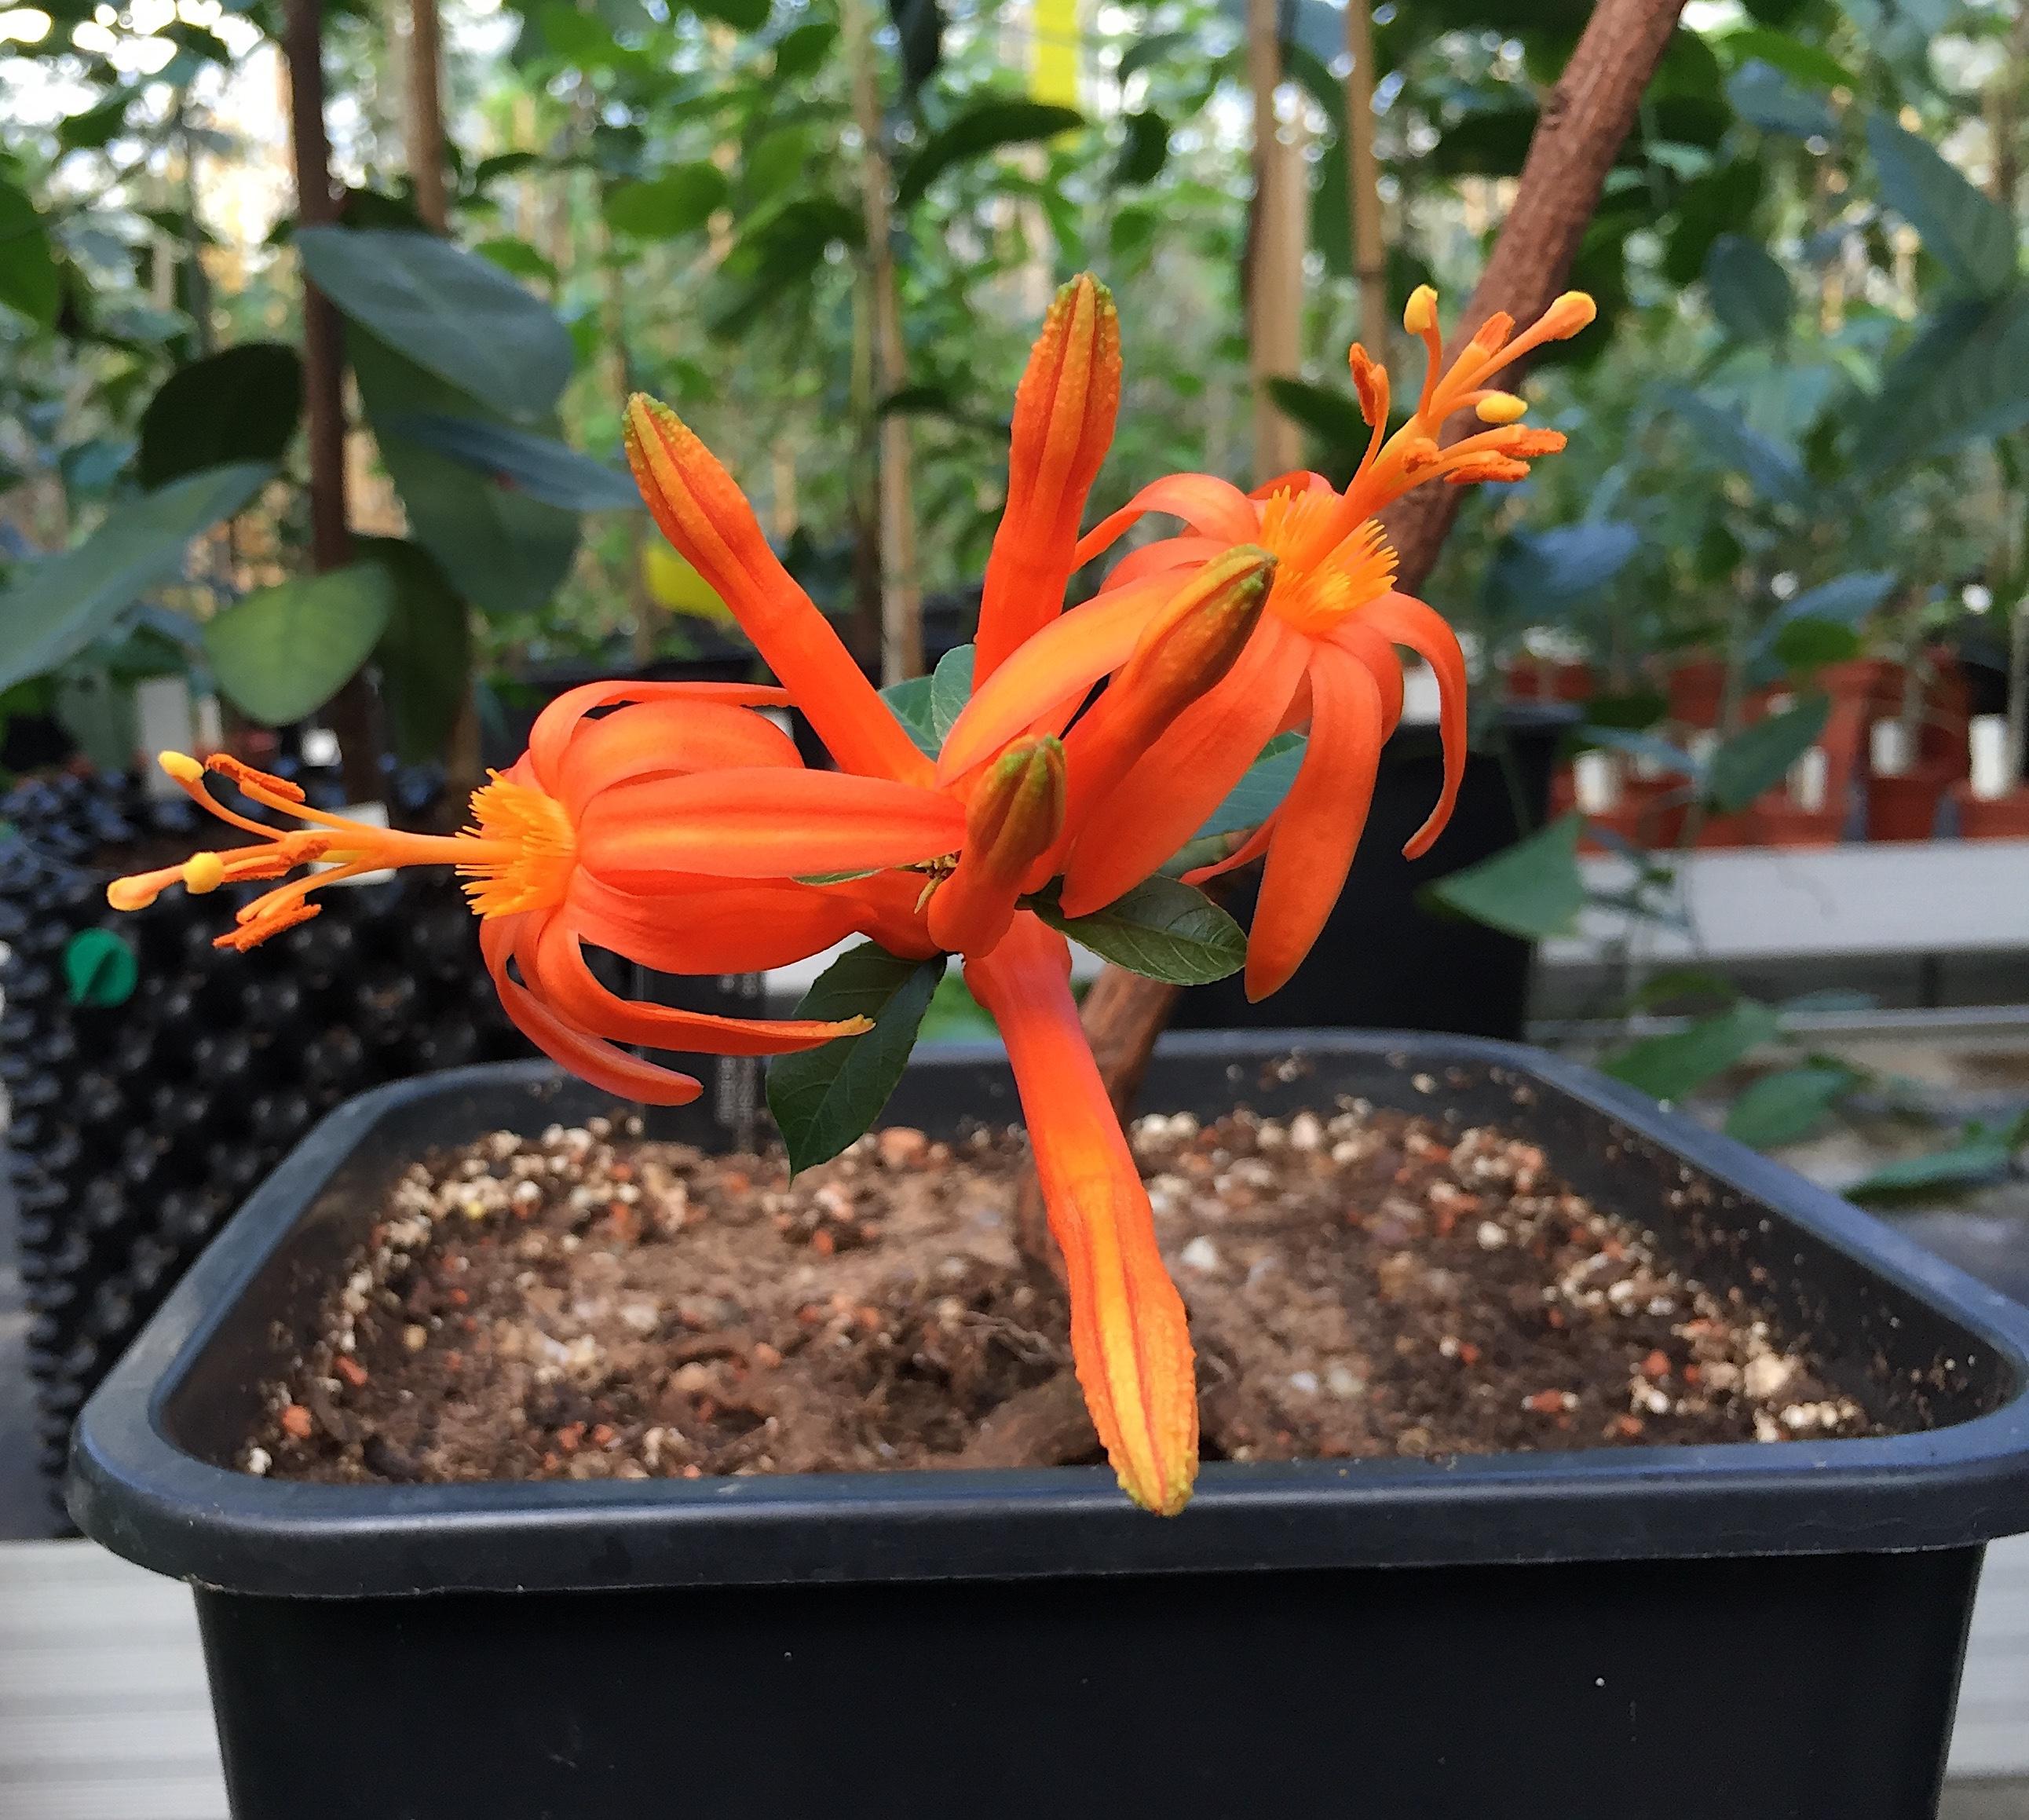 Passiflora rusbyi